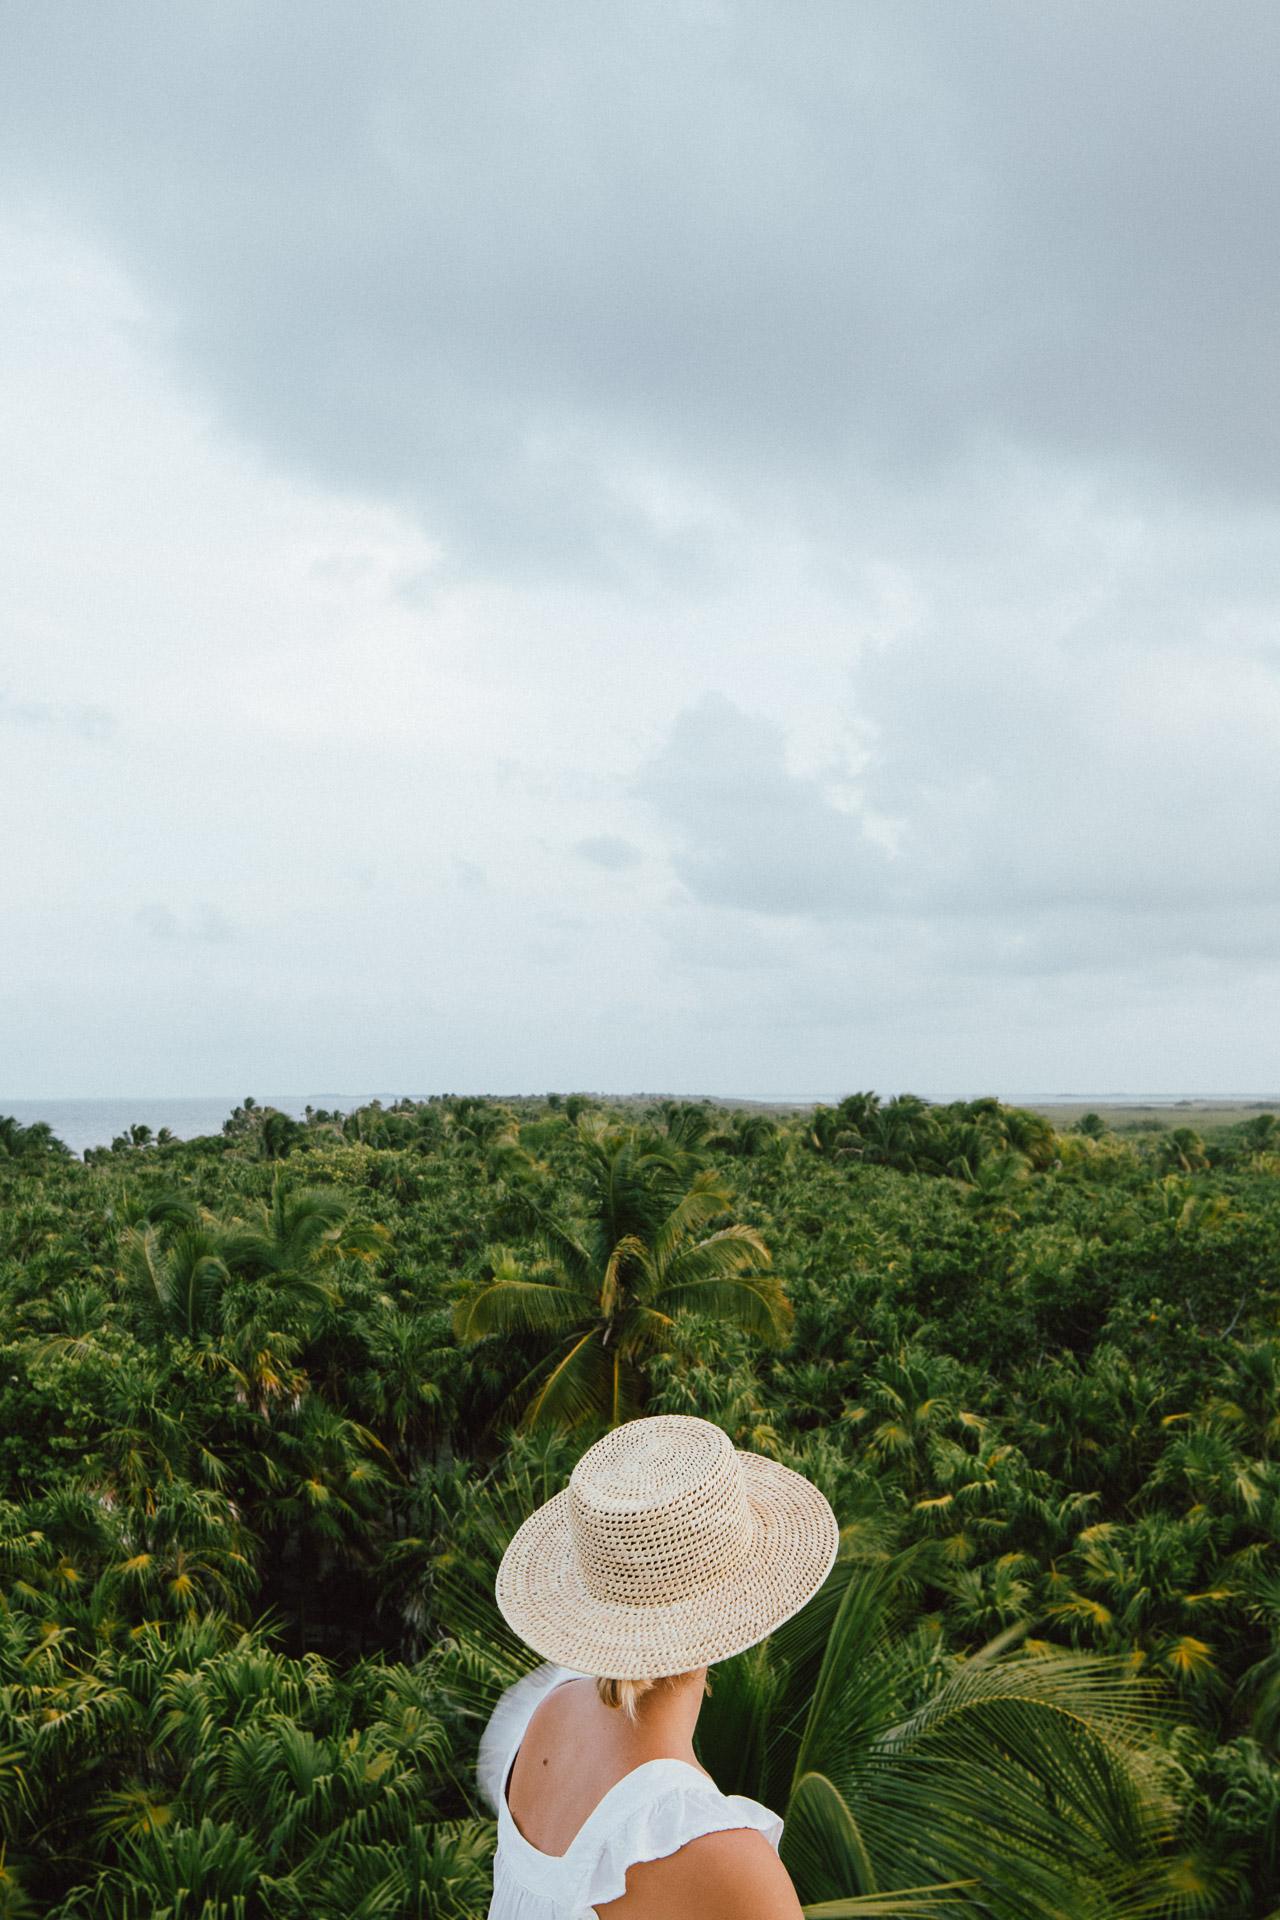 caribbean-hotel-resort-photographer-olas-tulum-mexico-3816.jpg